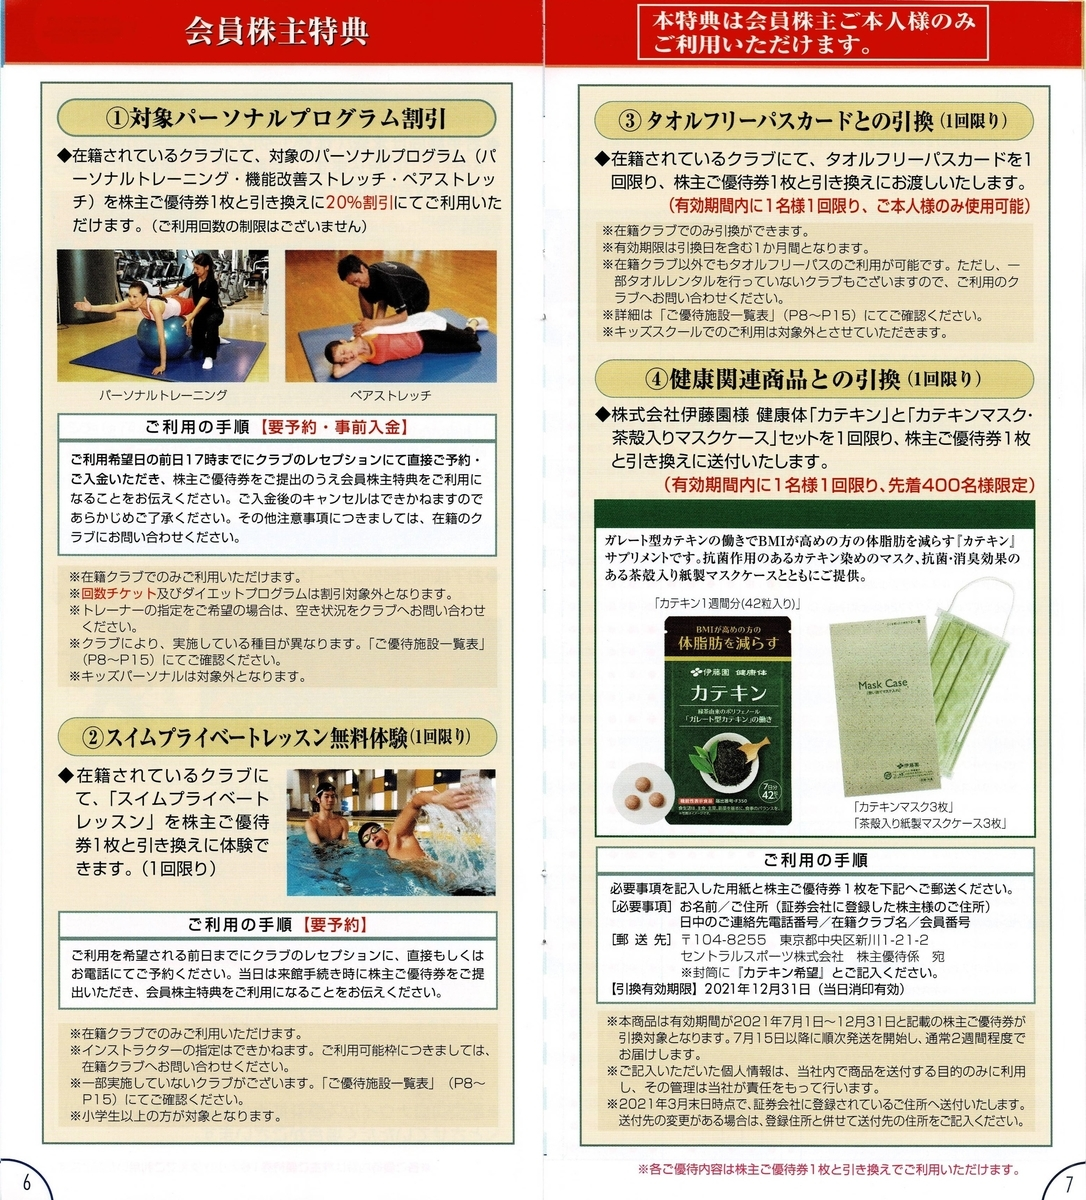 f:id:hanayamatoro:20210607223656j:plain